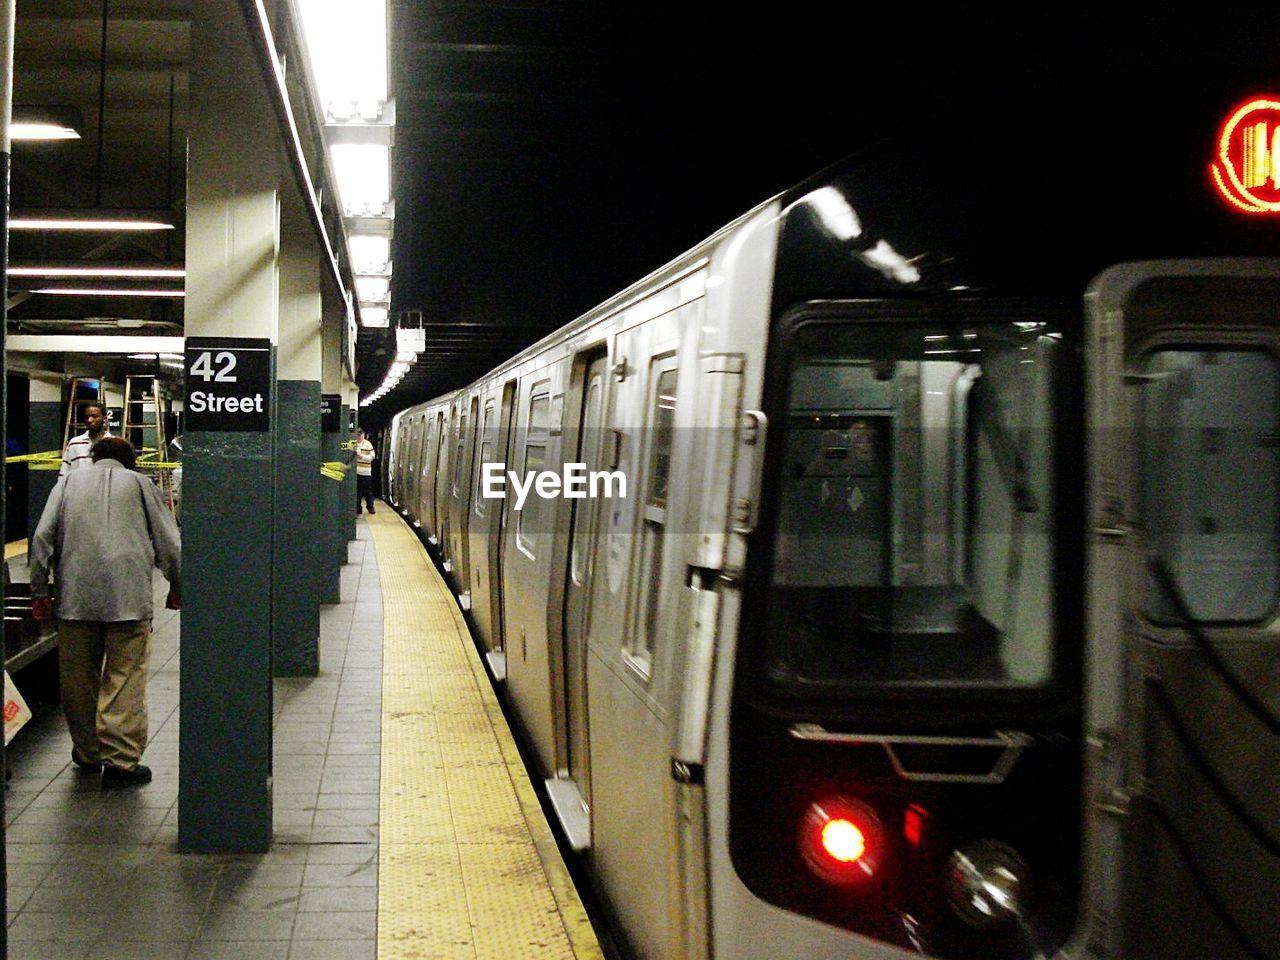 People by train at illuminated subway station platform